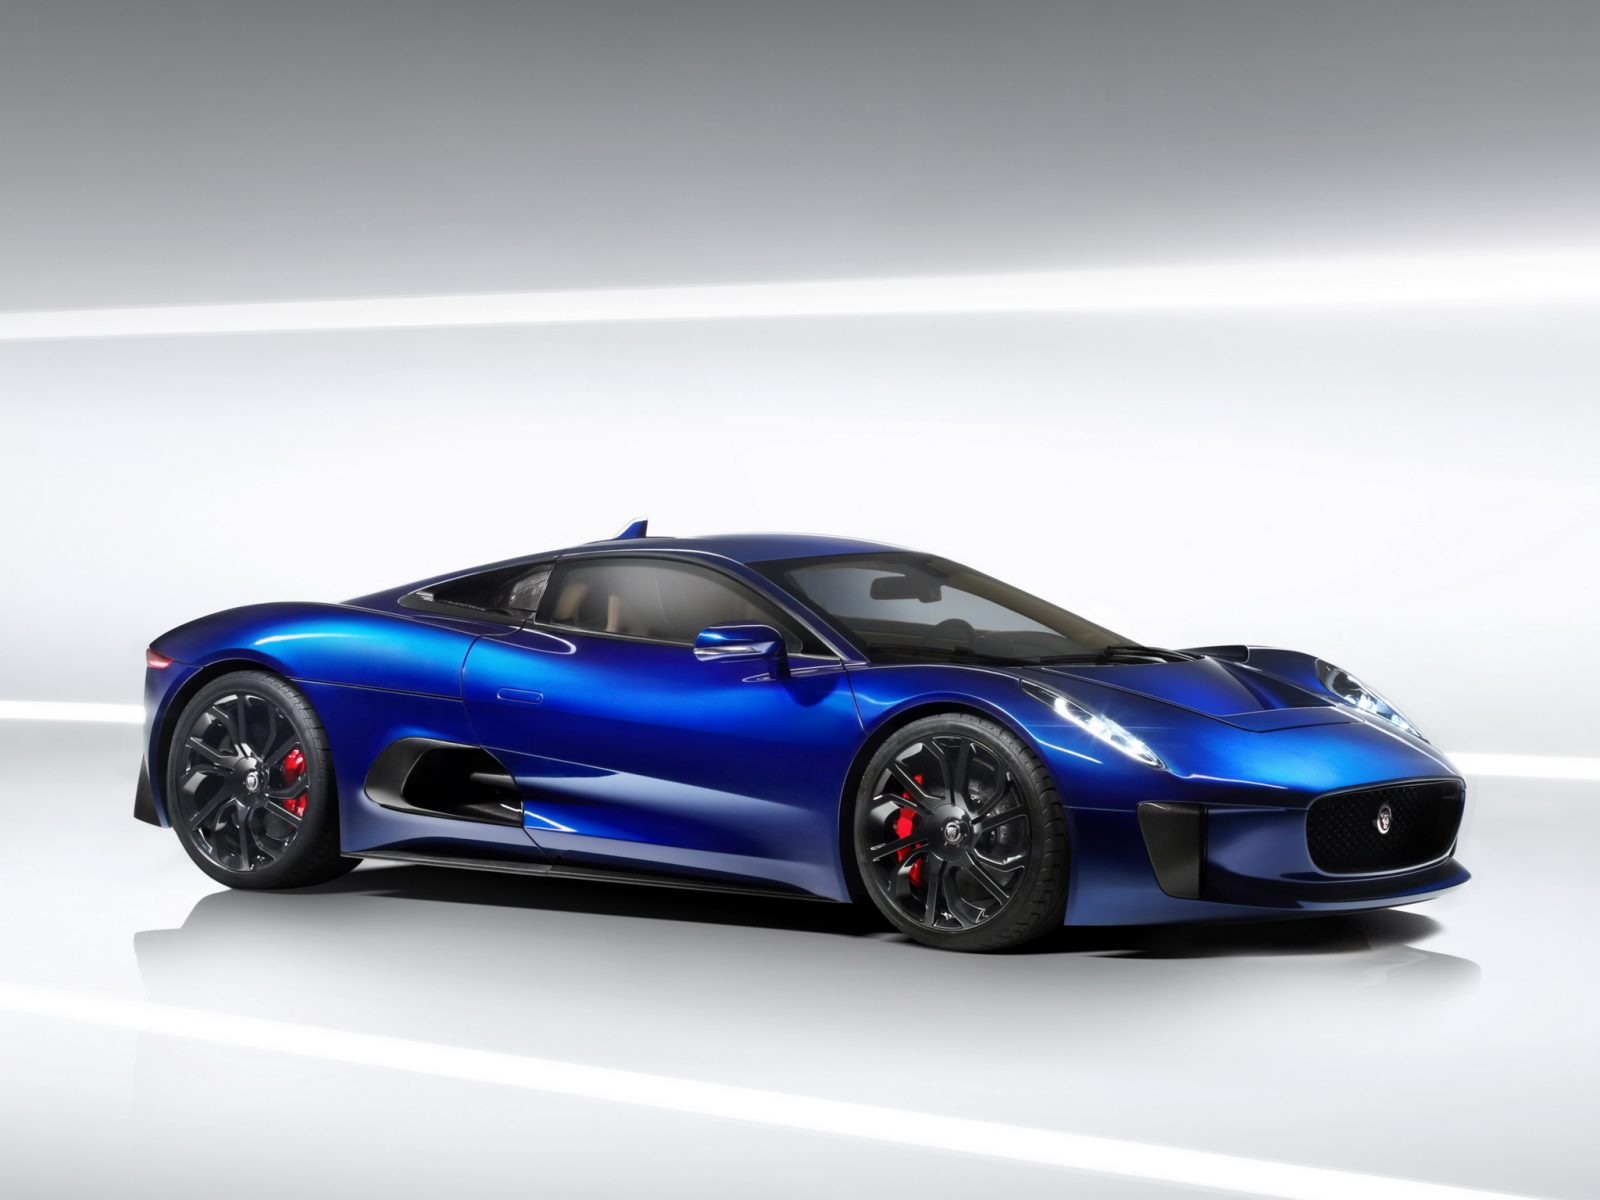 Jaguar C X75 Hybrid Prototype 1